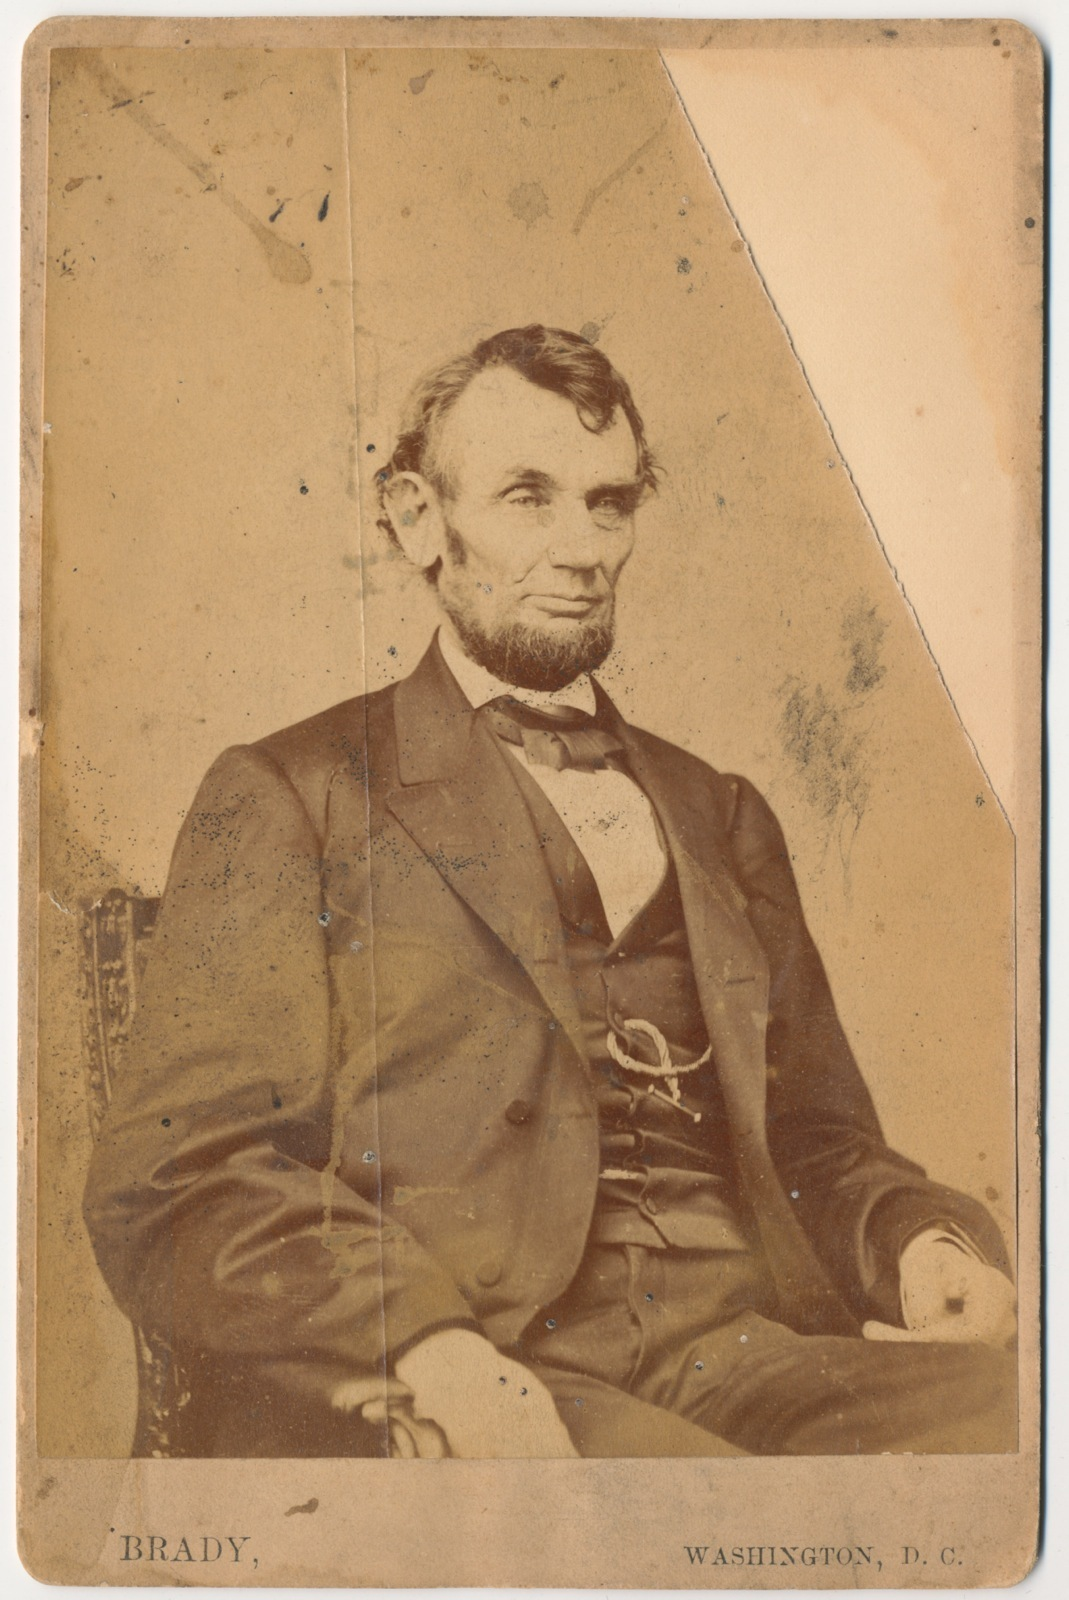 FileAbraham Lincoln O92 Cabinet Card by Brady 1864JPG